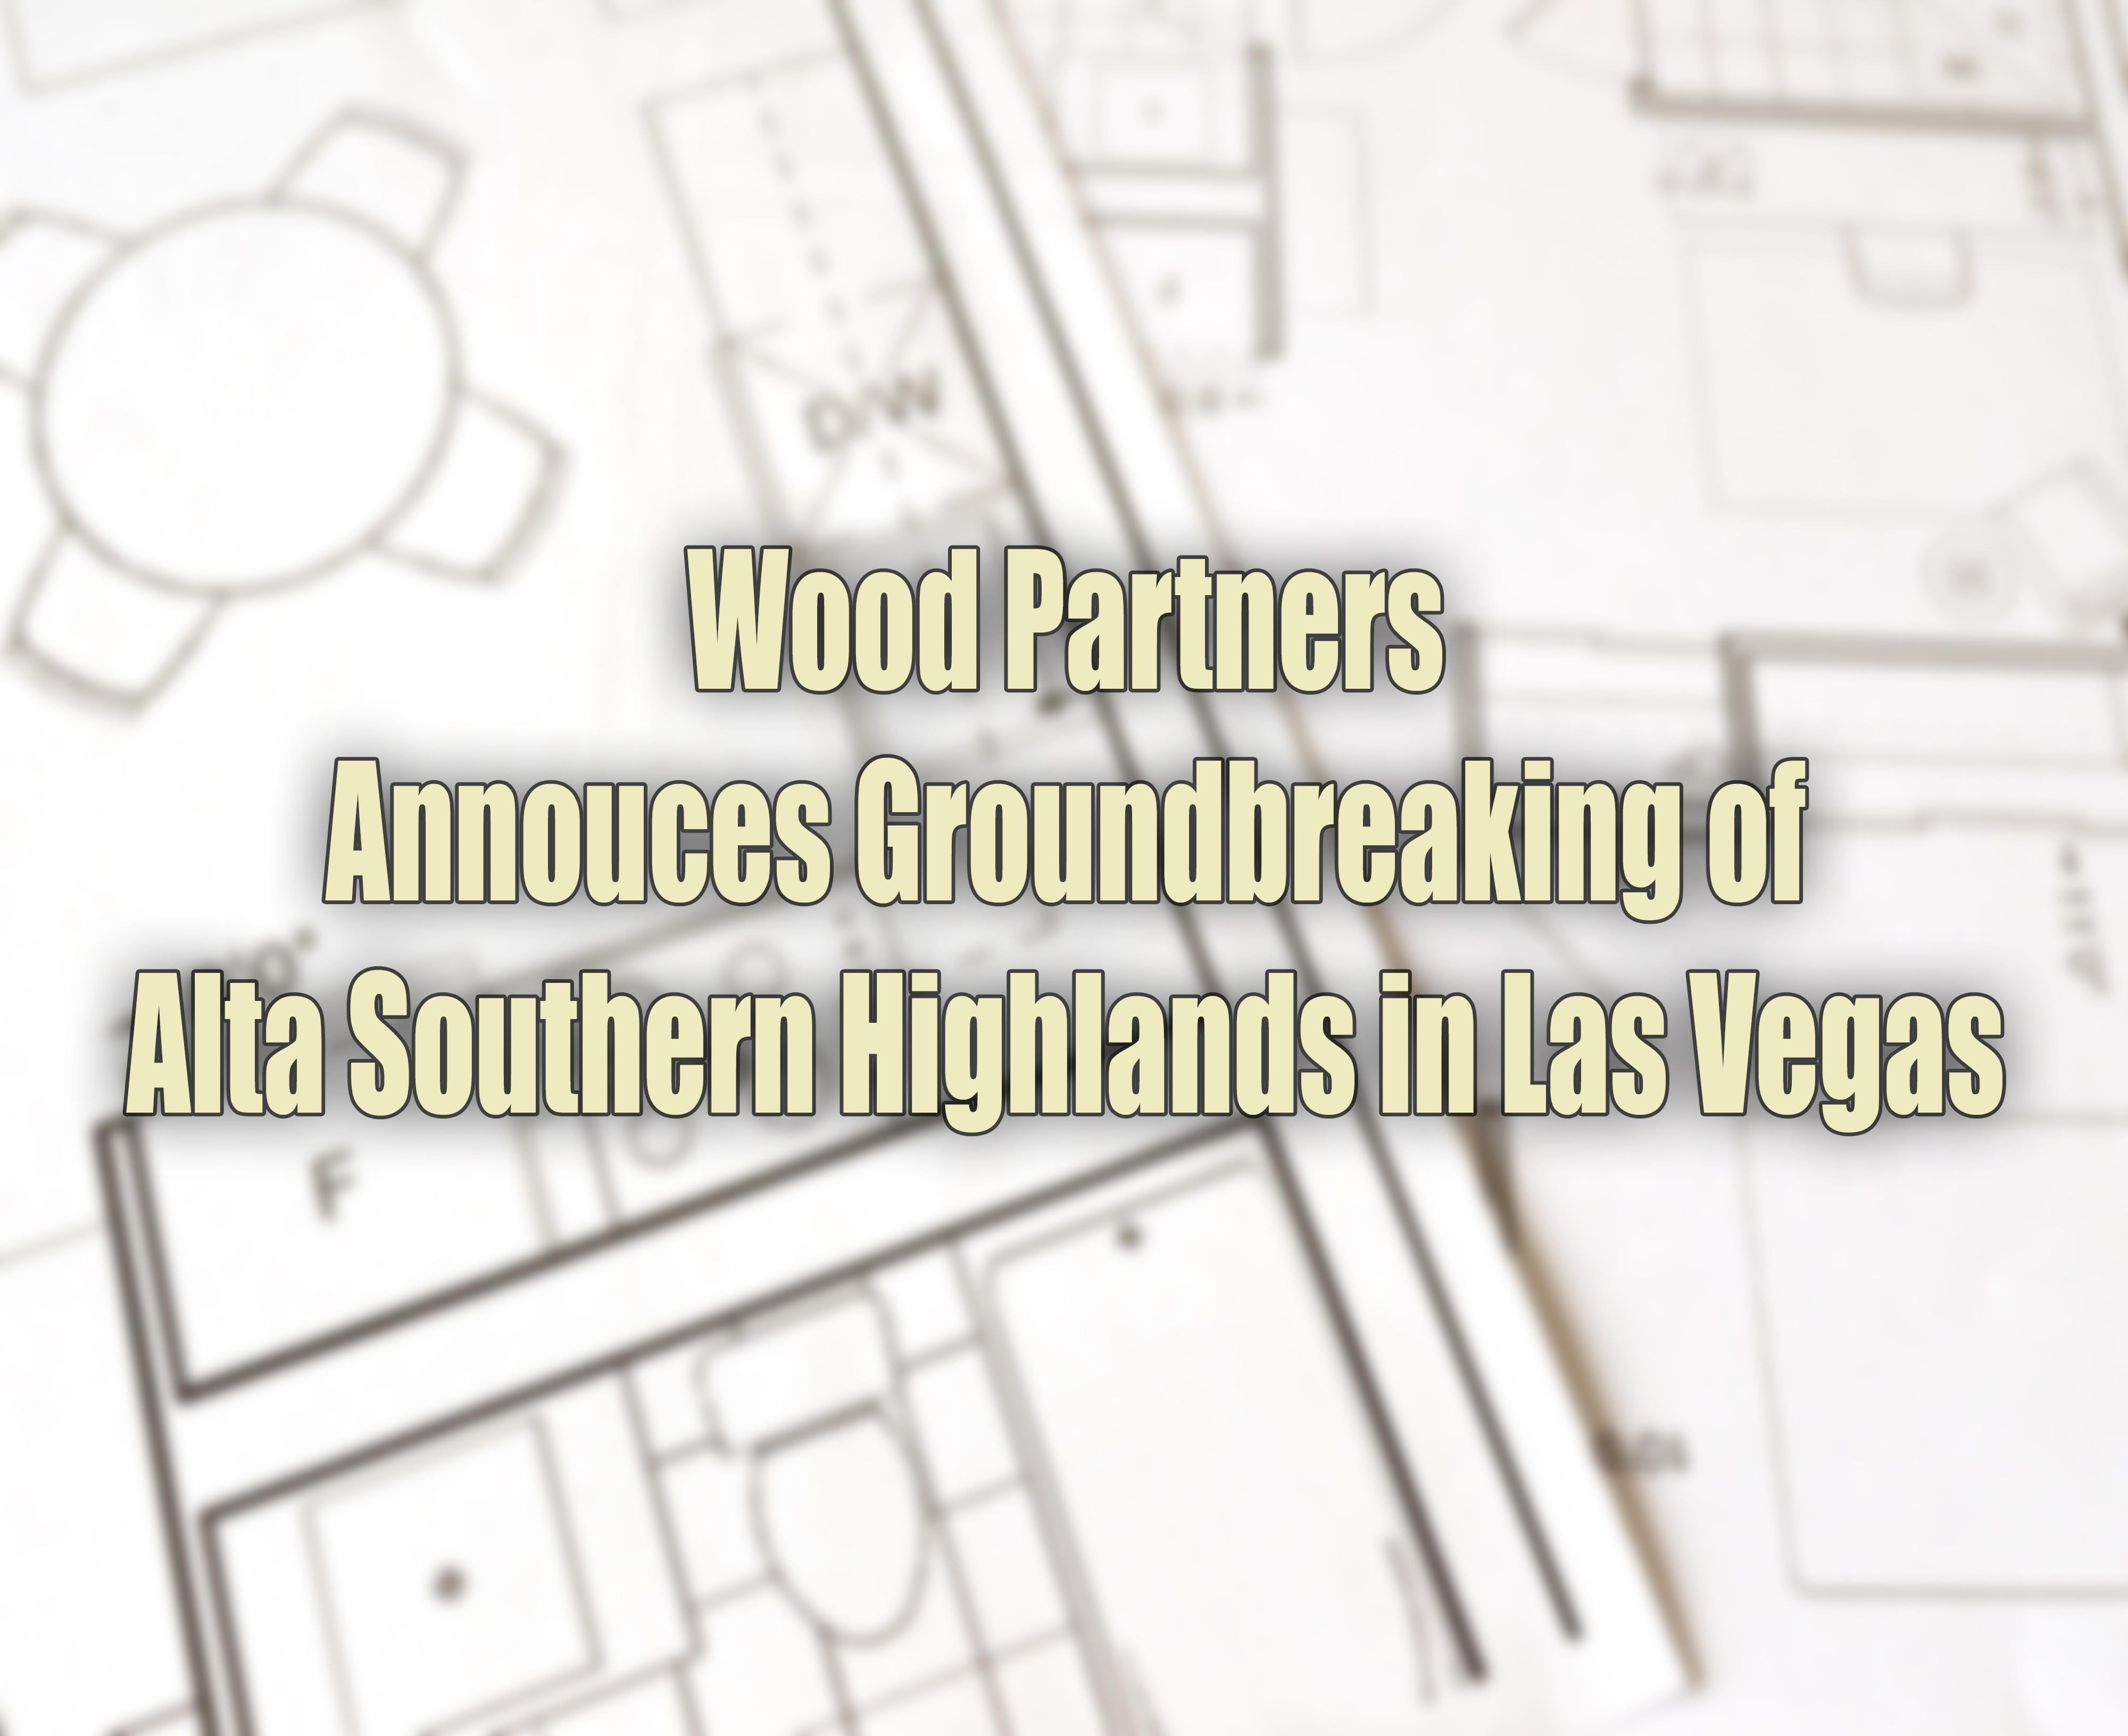 Alta Southern Highlands in Las Vegas.jpg